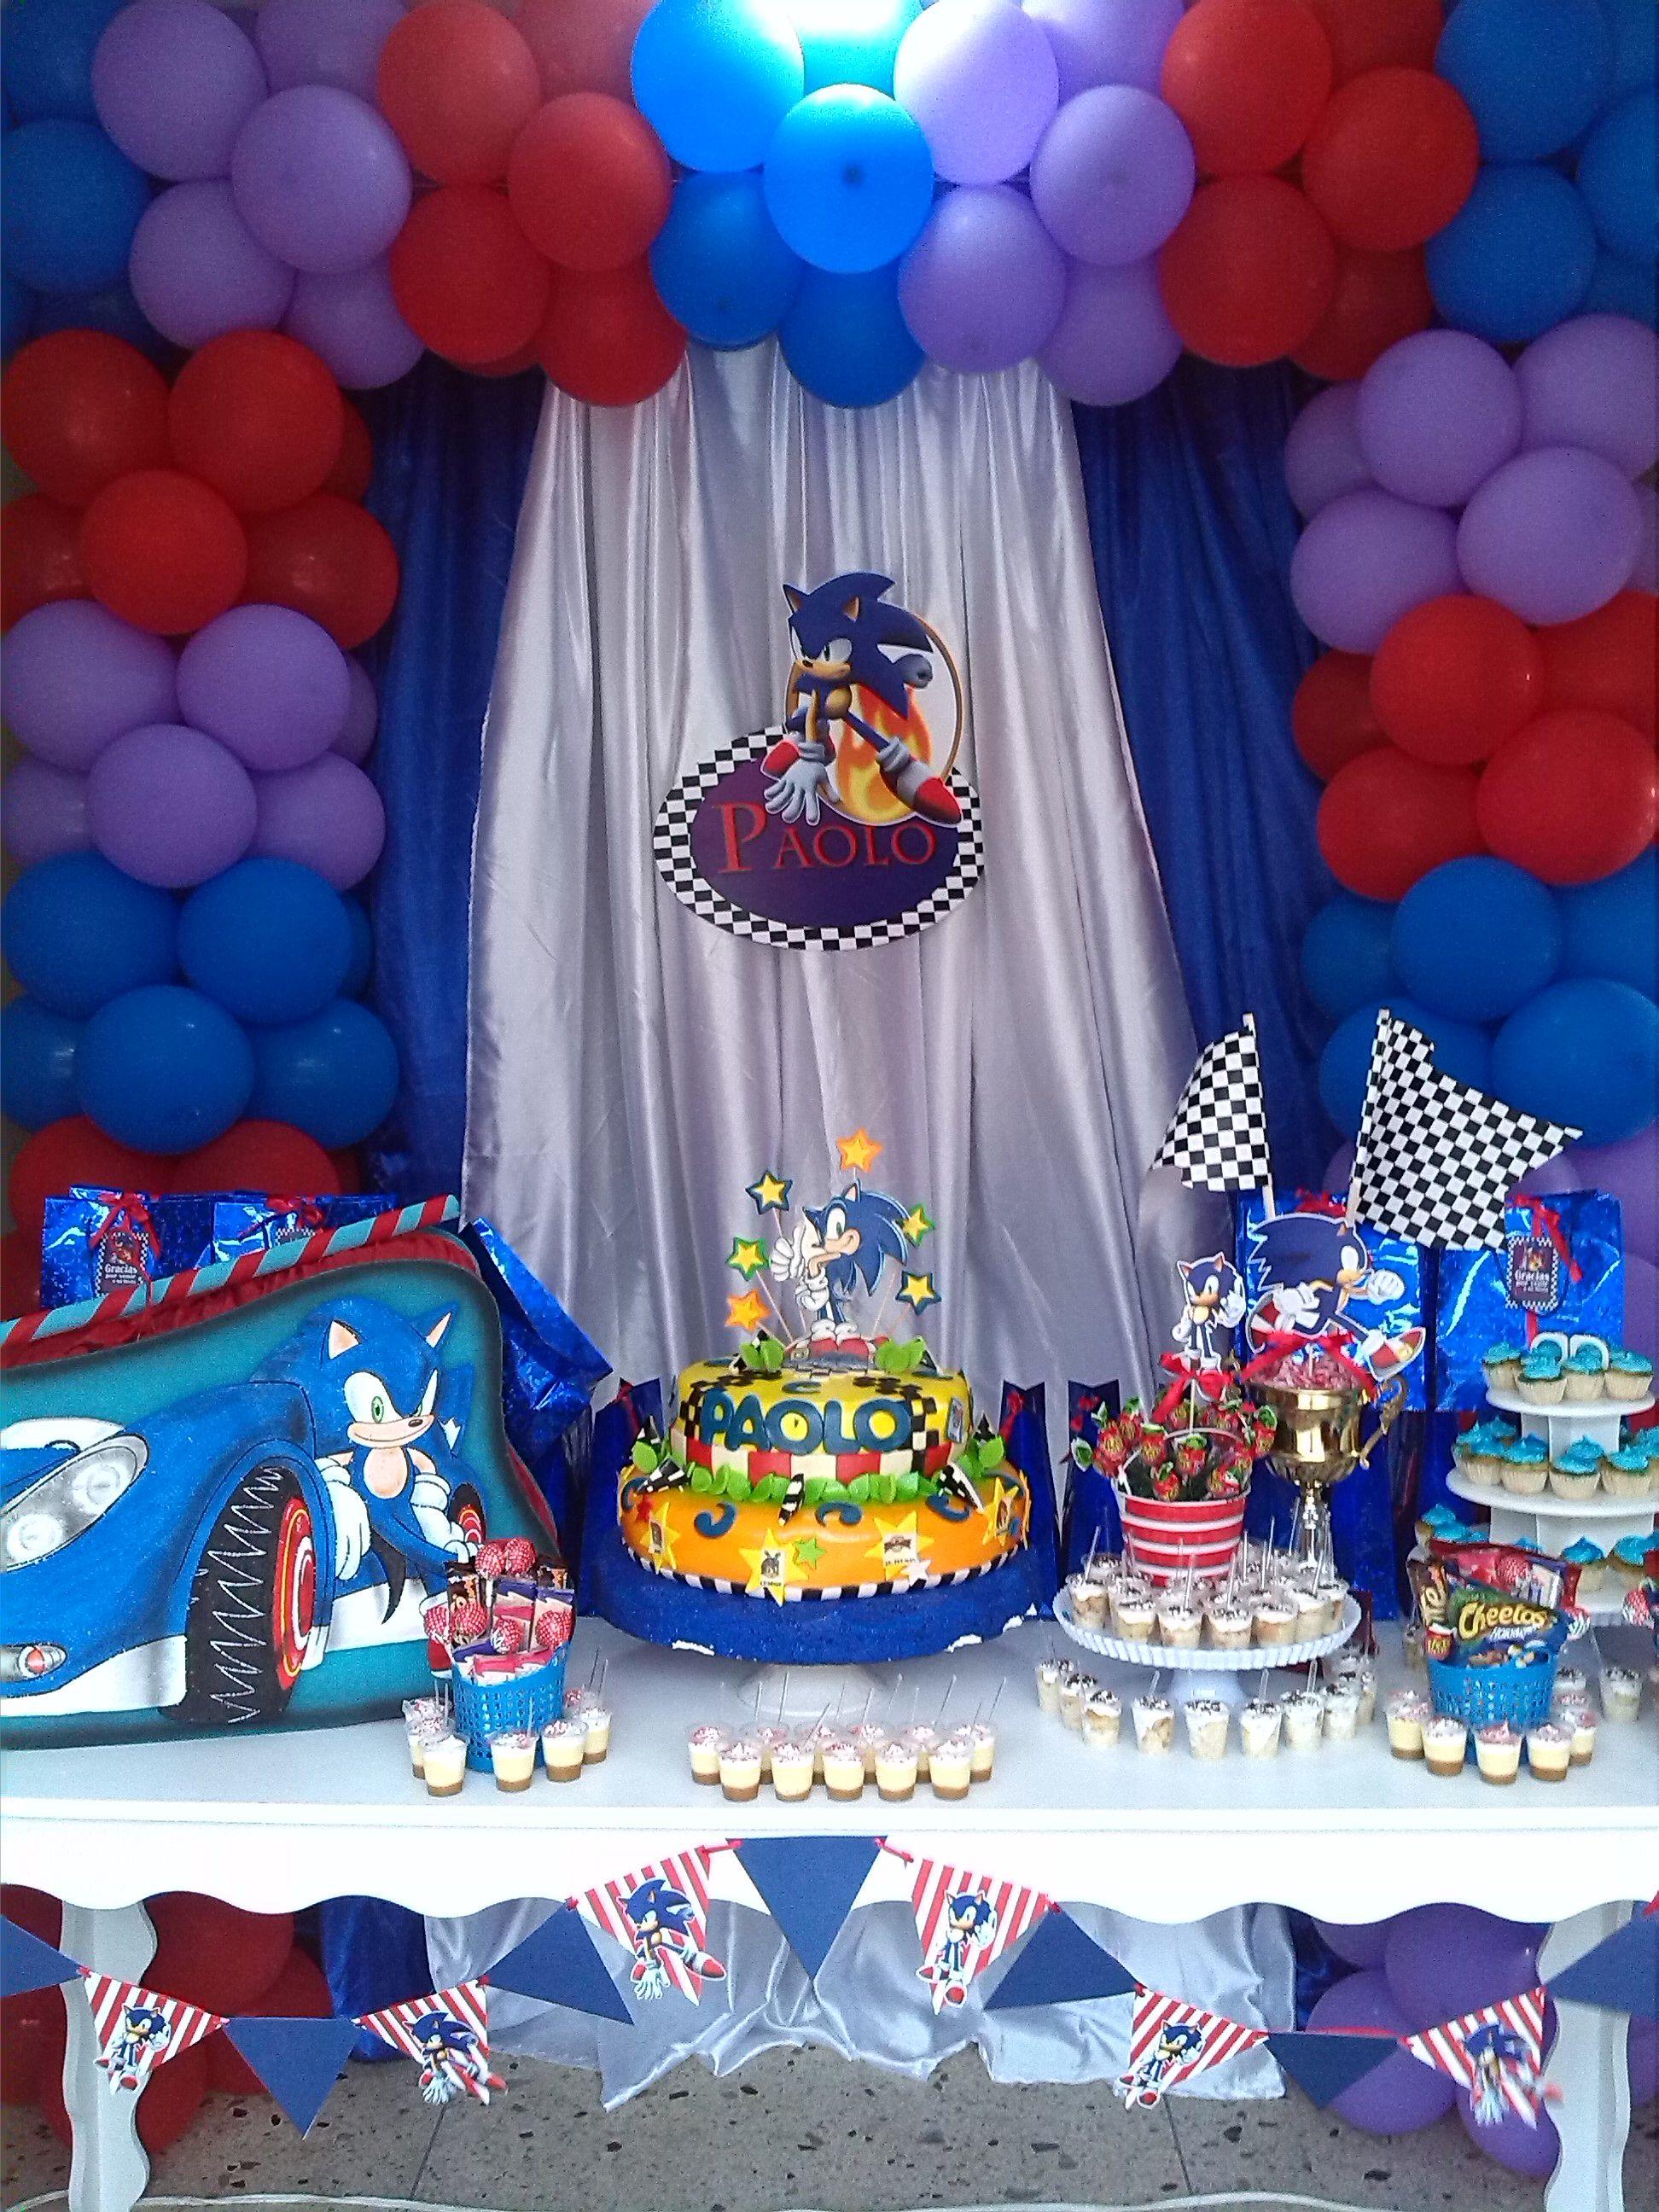 Fiesta de sonic mesa de dulces fiesta pinterest - Decoracion fiesta de cumpleanos infantil ...